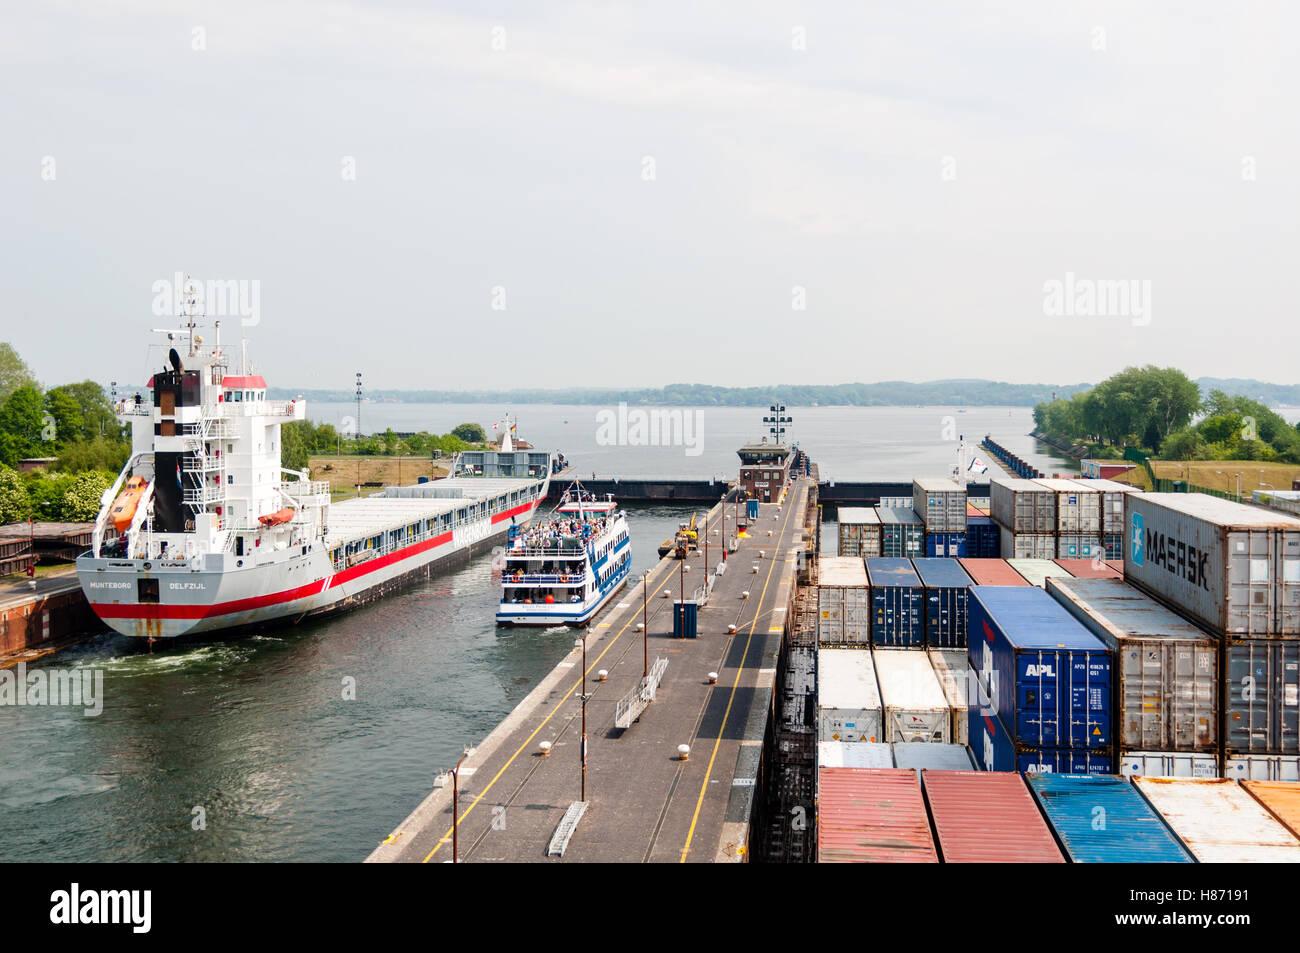 Approaching Kiel Canal, Germany - Stock Image